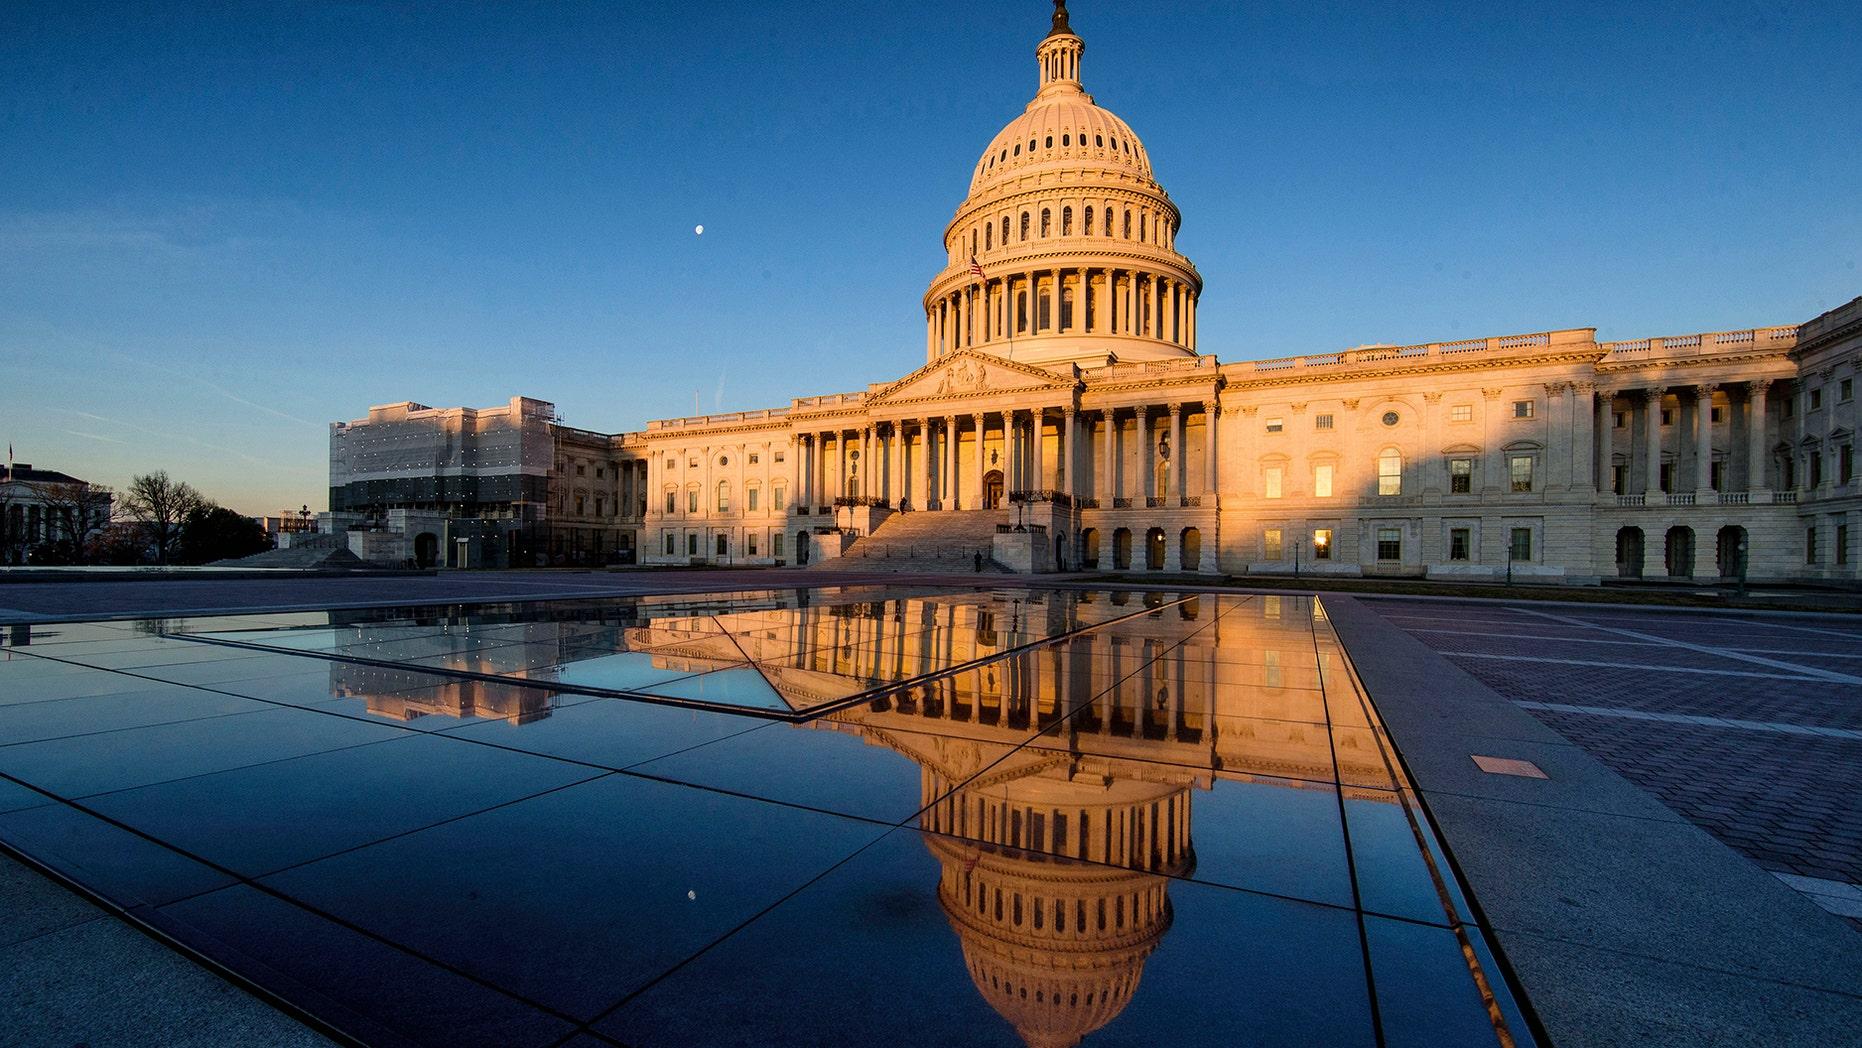 The U.S Capitol is seen at sunrise, Sunday, March 24, 2019, in Washington. (AP Photo/Alex Brandon)